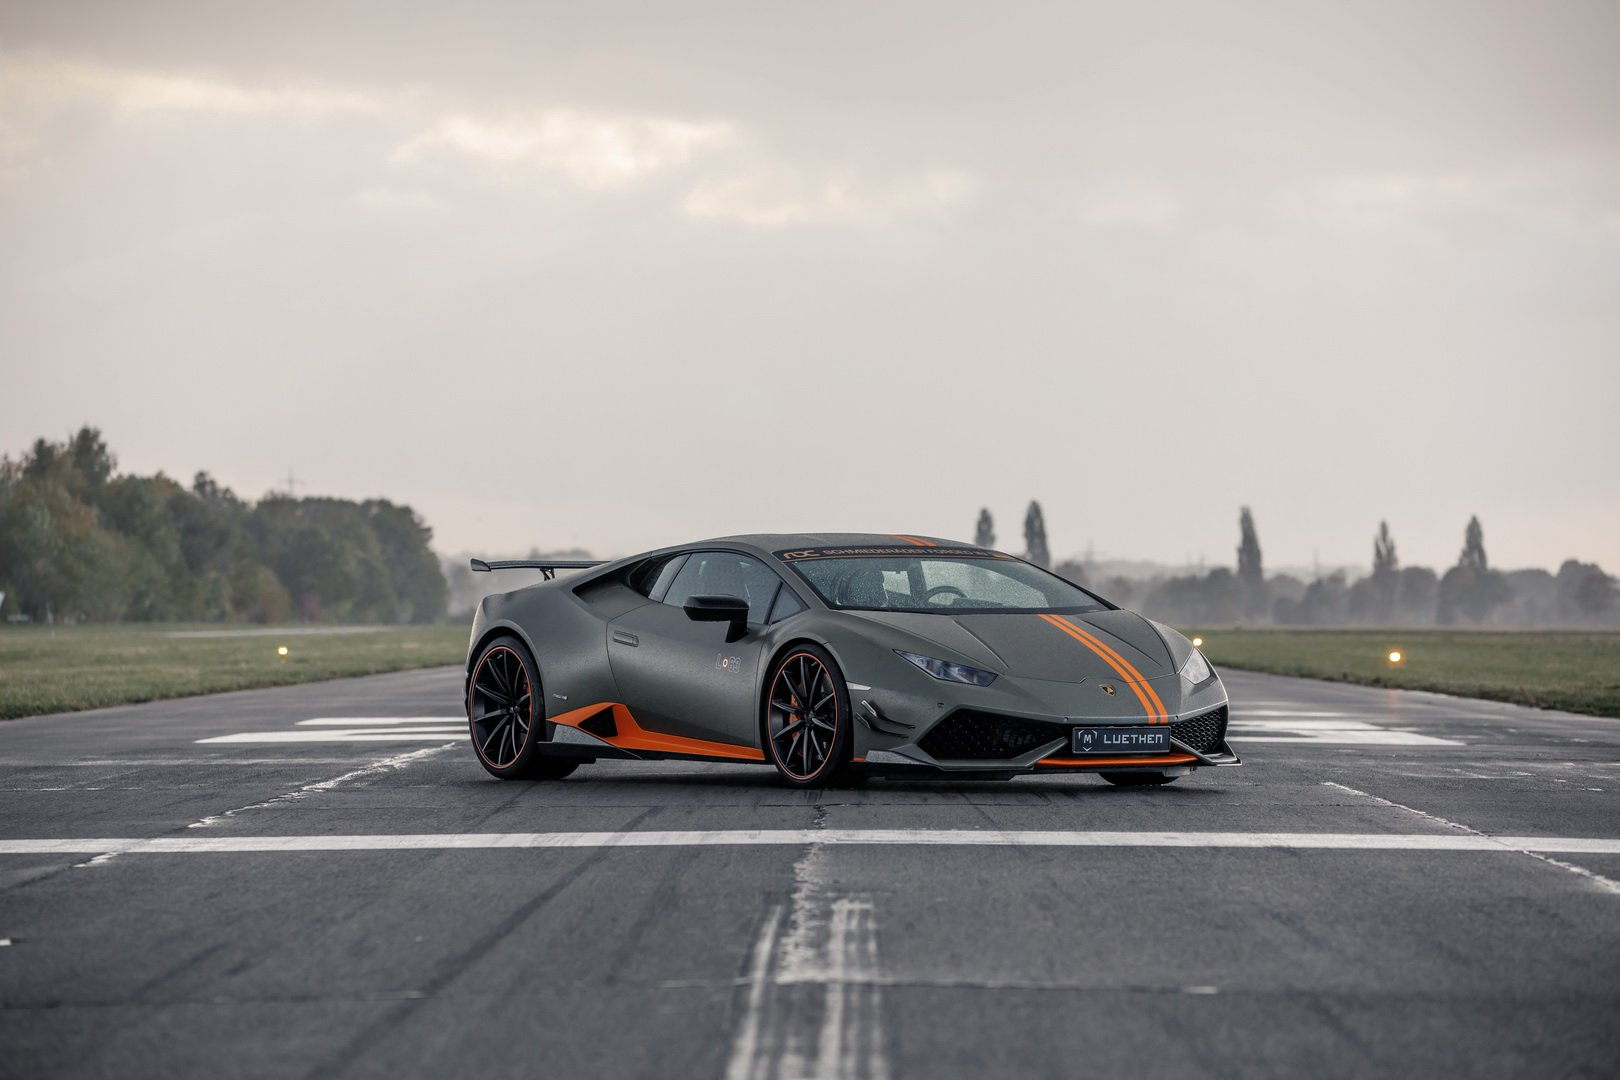 Lamborghini Huracan Avio by Luethen Motorsport (17)